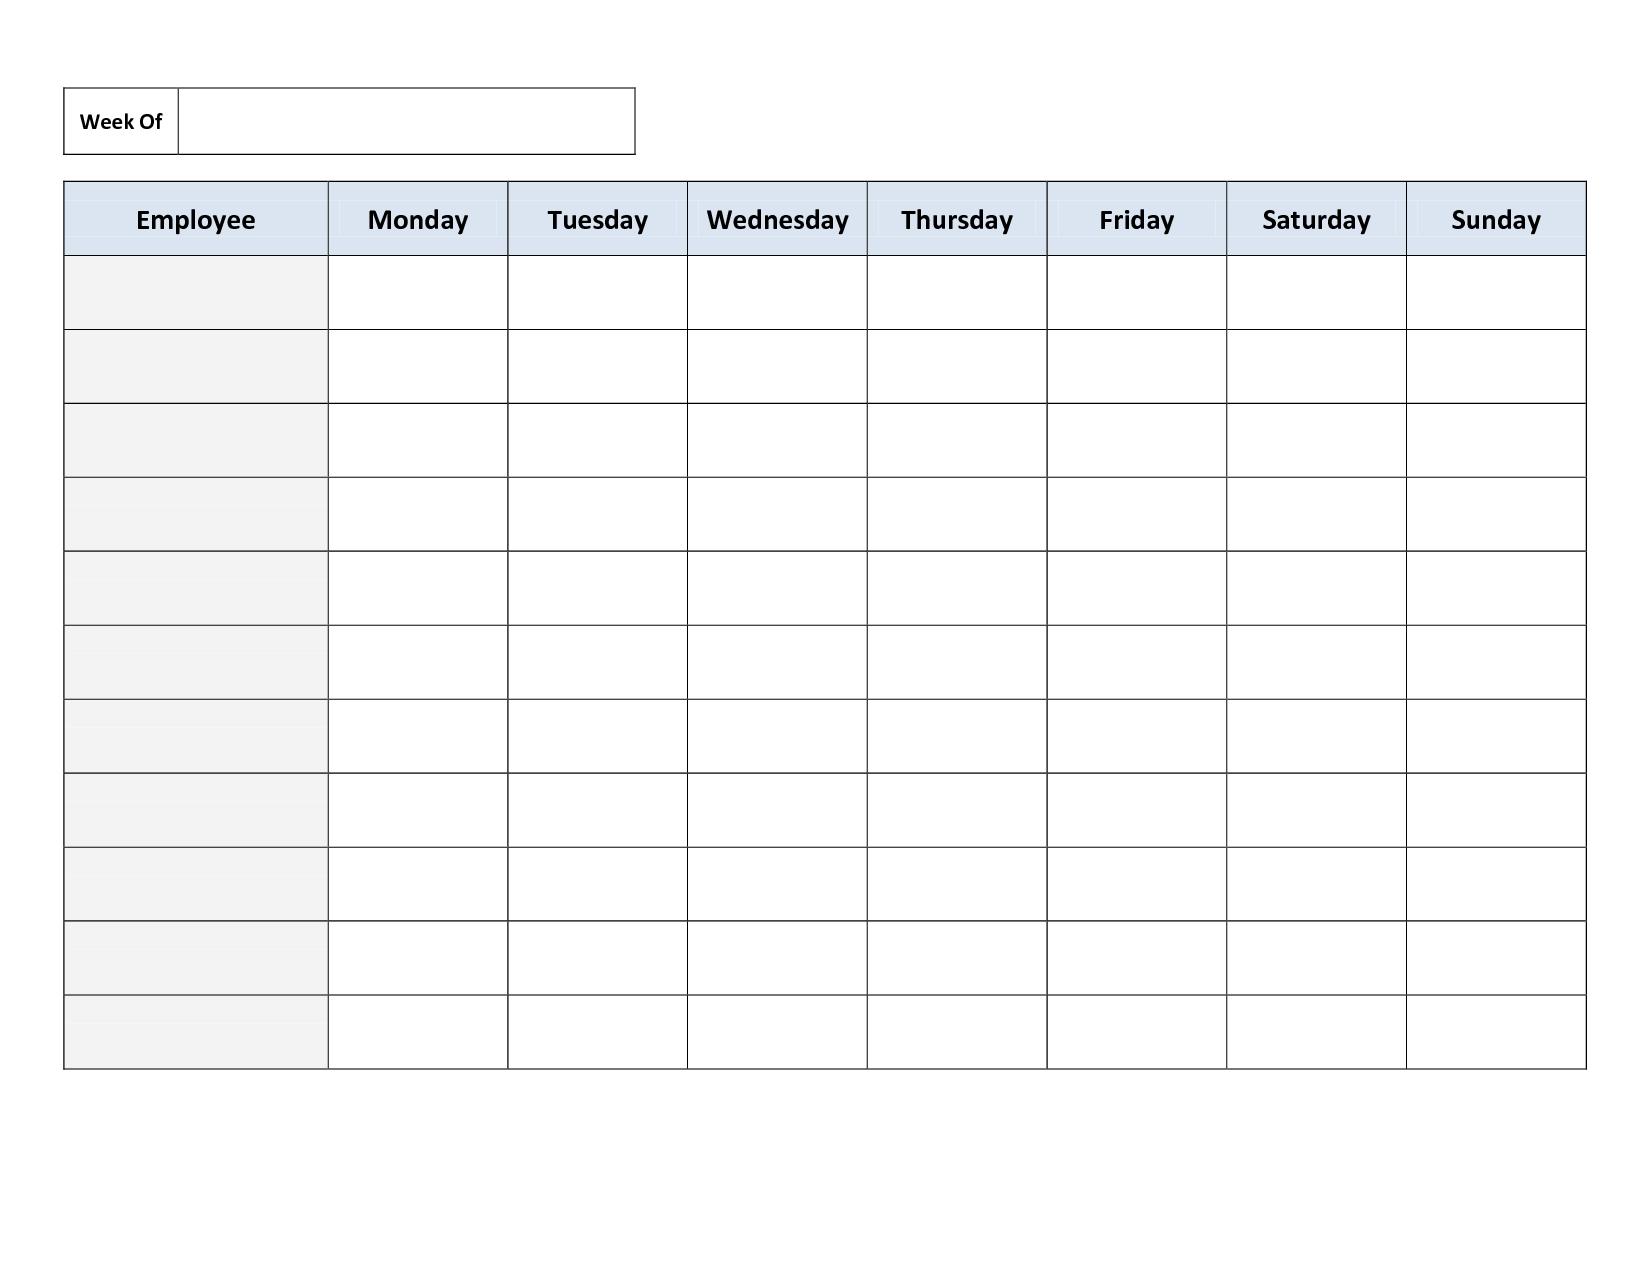 Weekly Employee Work Schedule Template. Free Blank Schedule.pdf - Free Printable Weekly Work Schedule